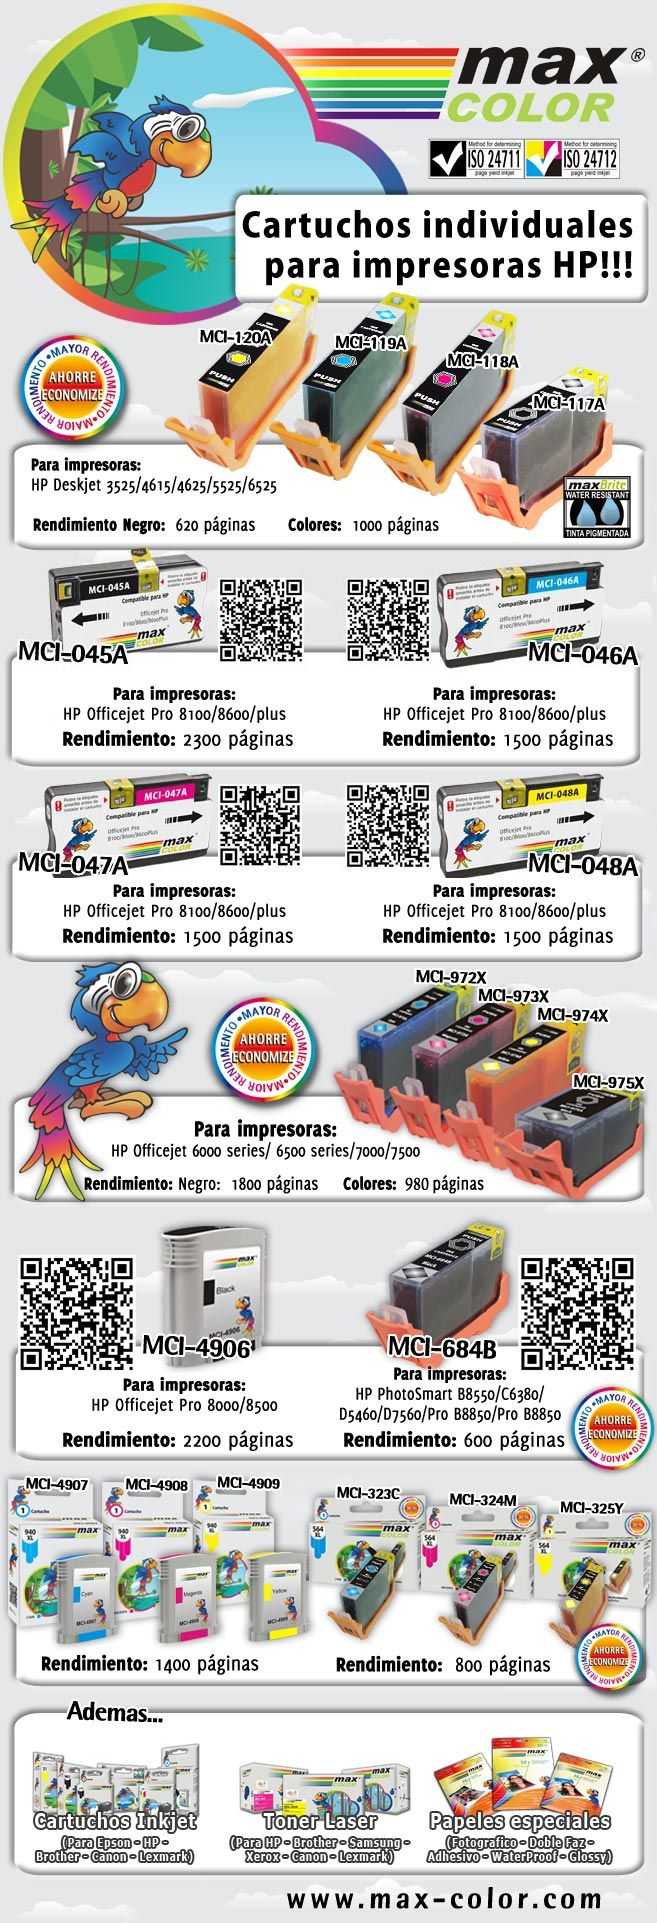 MCI-117A MCI118A MCI-119A MCI-120A MCI-972A MCI-973A MCI-974A MCI-975A MCI-4907 MCI-4908 MCI-4909 MCI-045A MCI-046A MCI-047A MCI-048A MCI-684B MCI-323C MCI-324M MCI-325Y